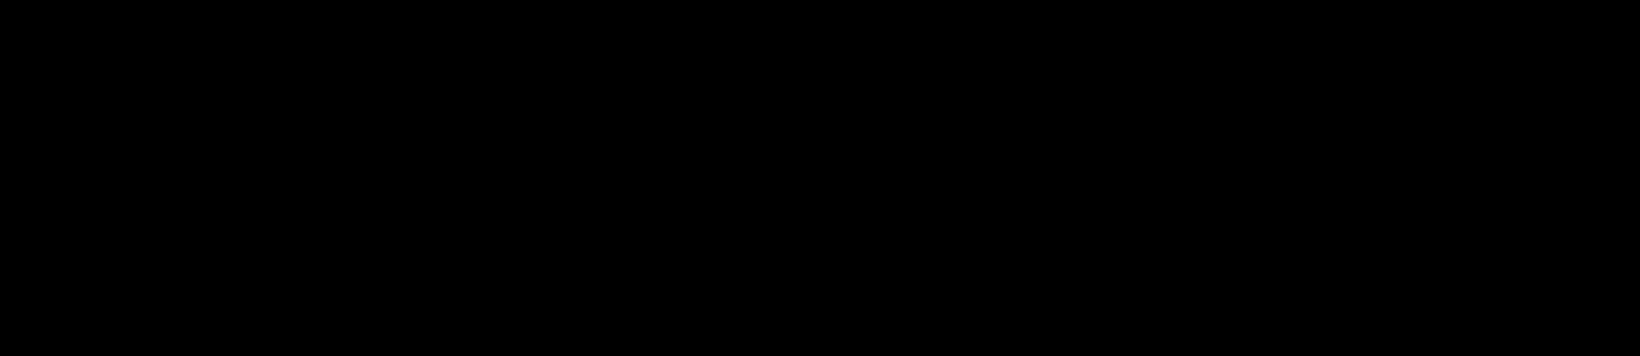 mollie-logo